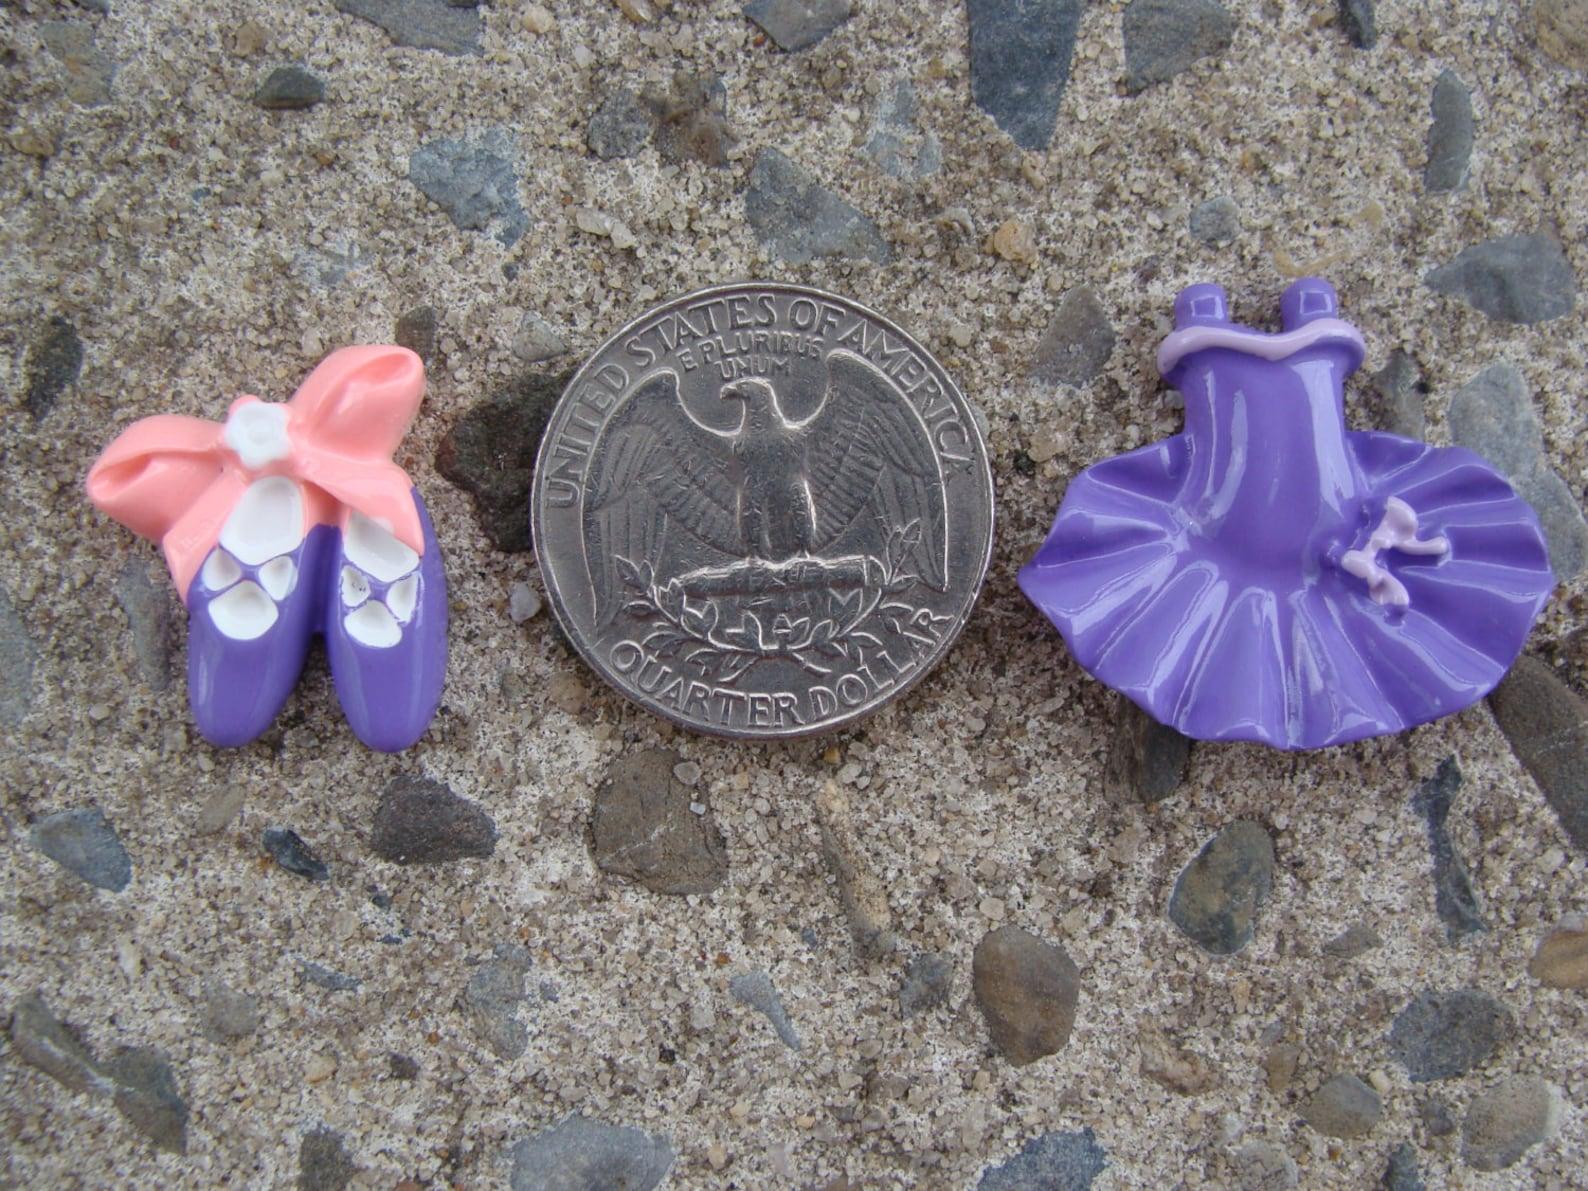 2 pink ballerina princess ballet tutu dress resin cabochon flatbacks flat back scrapbooking hair bow center crafts embellishment